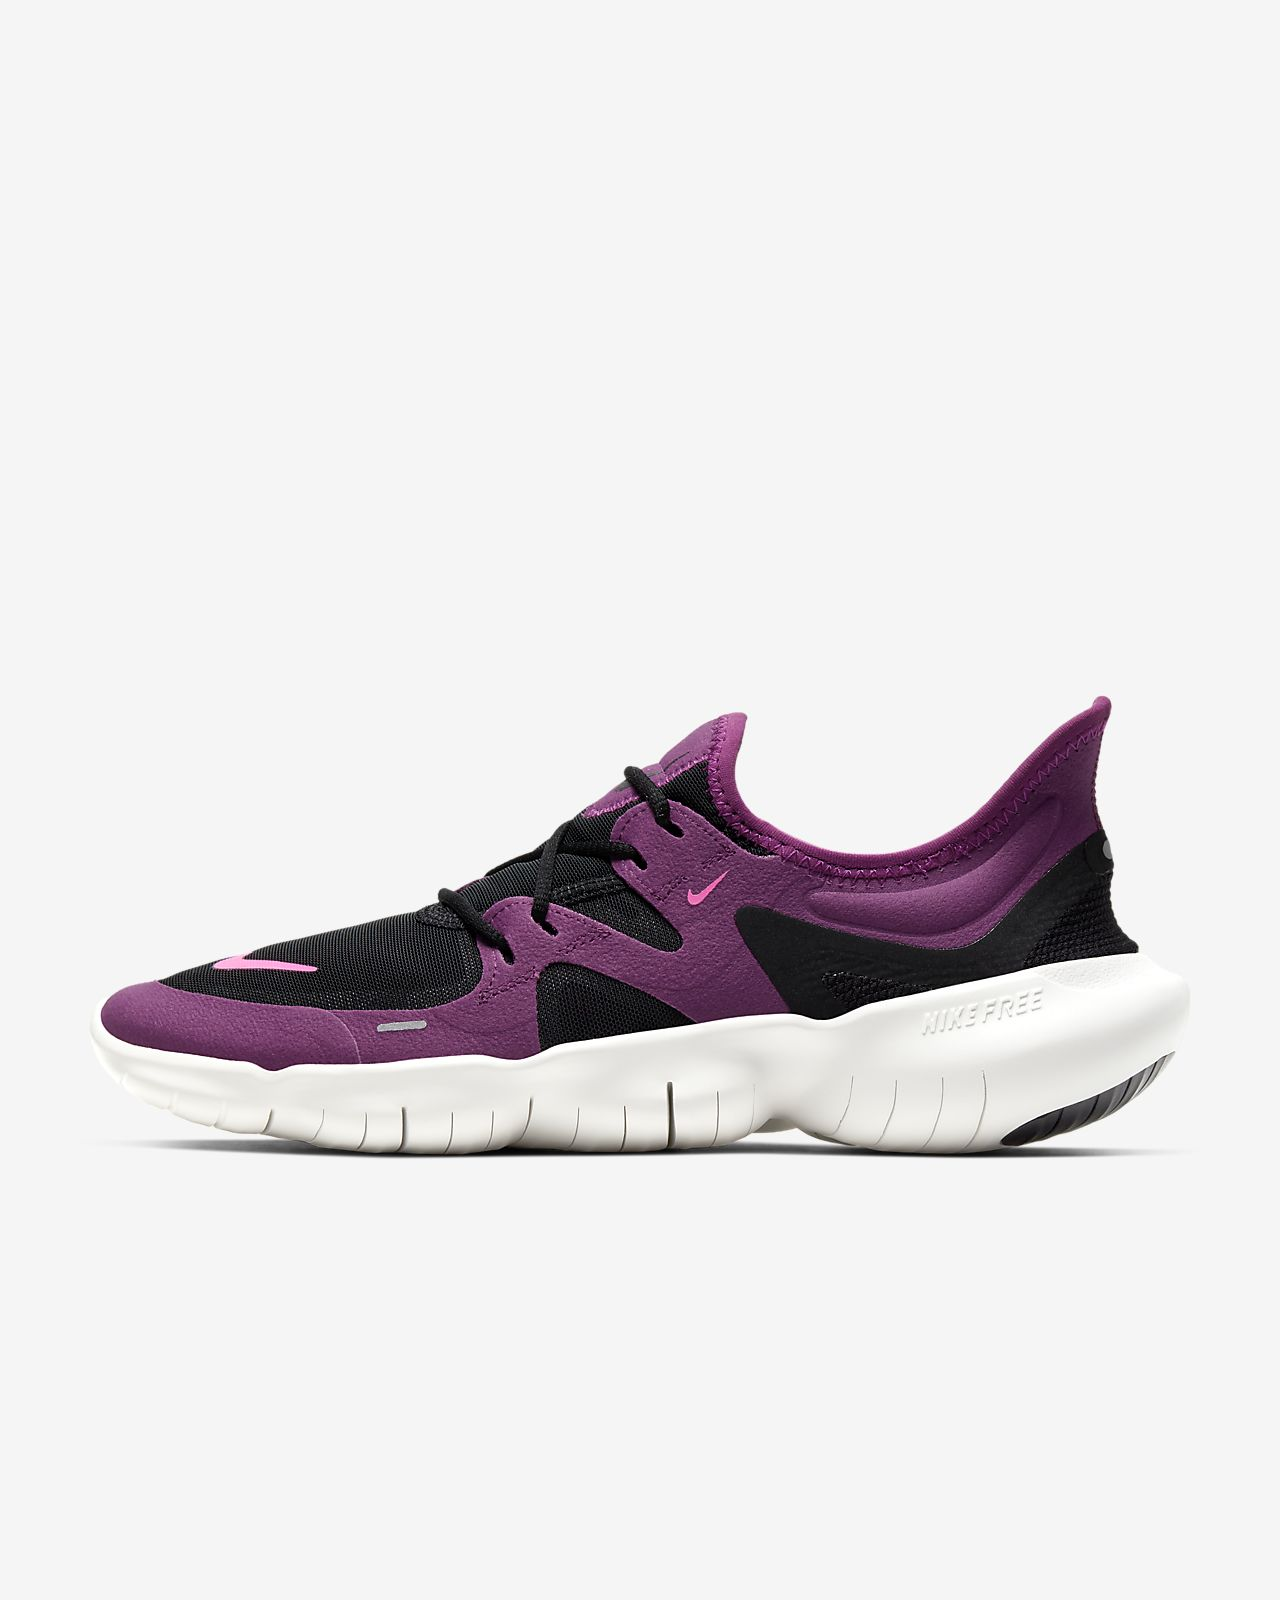 Nike Damen. Excellent Nike Damen With Nike Damen. Latest